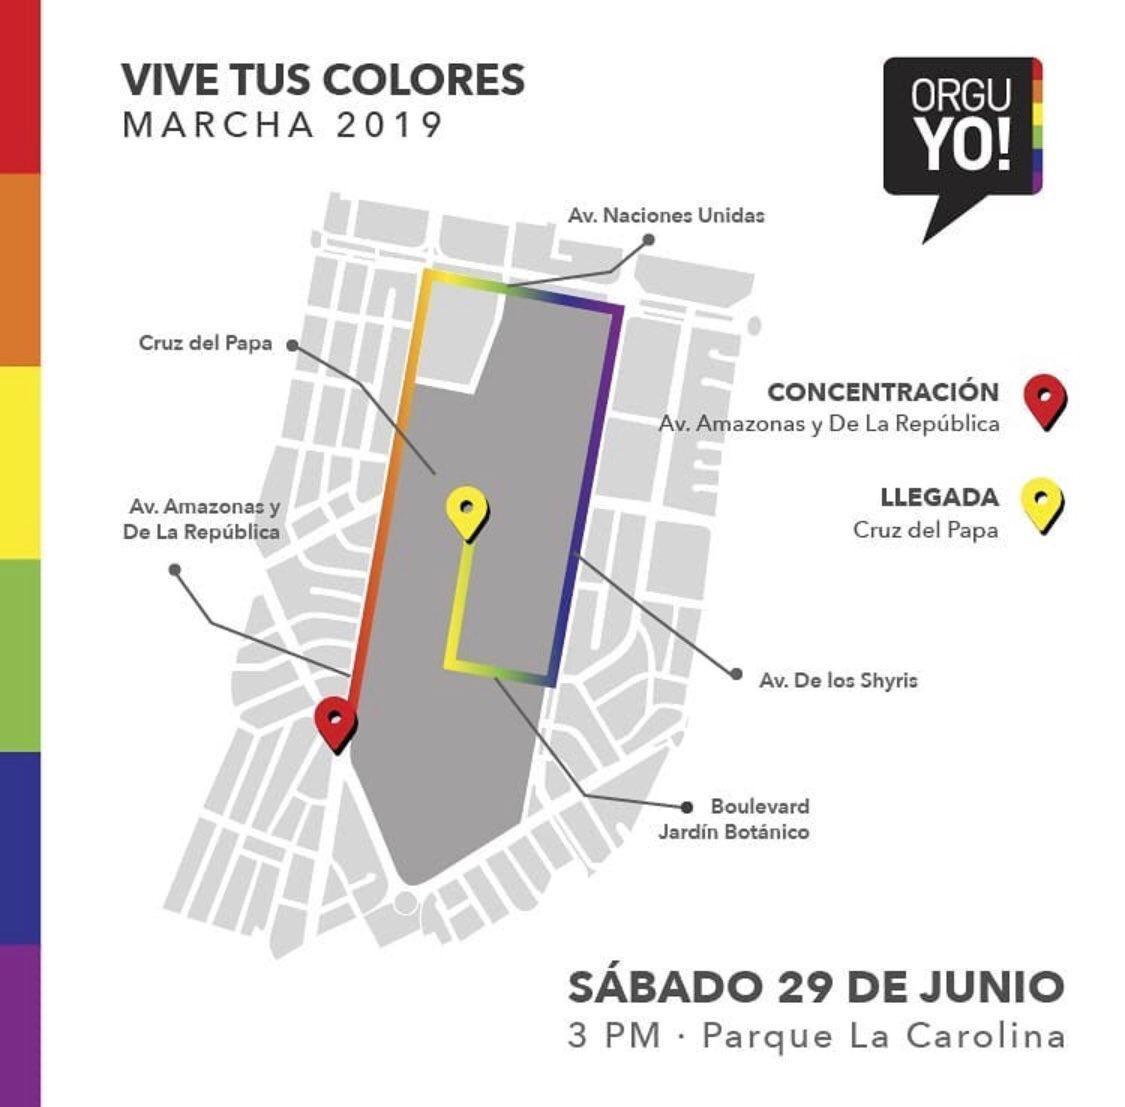 ¿Invitan al alcalde Jorge Yunda a la marcha por el Orgullo Lgbti en Quito?, AU-D se suma